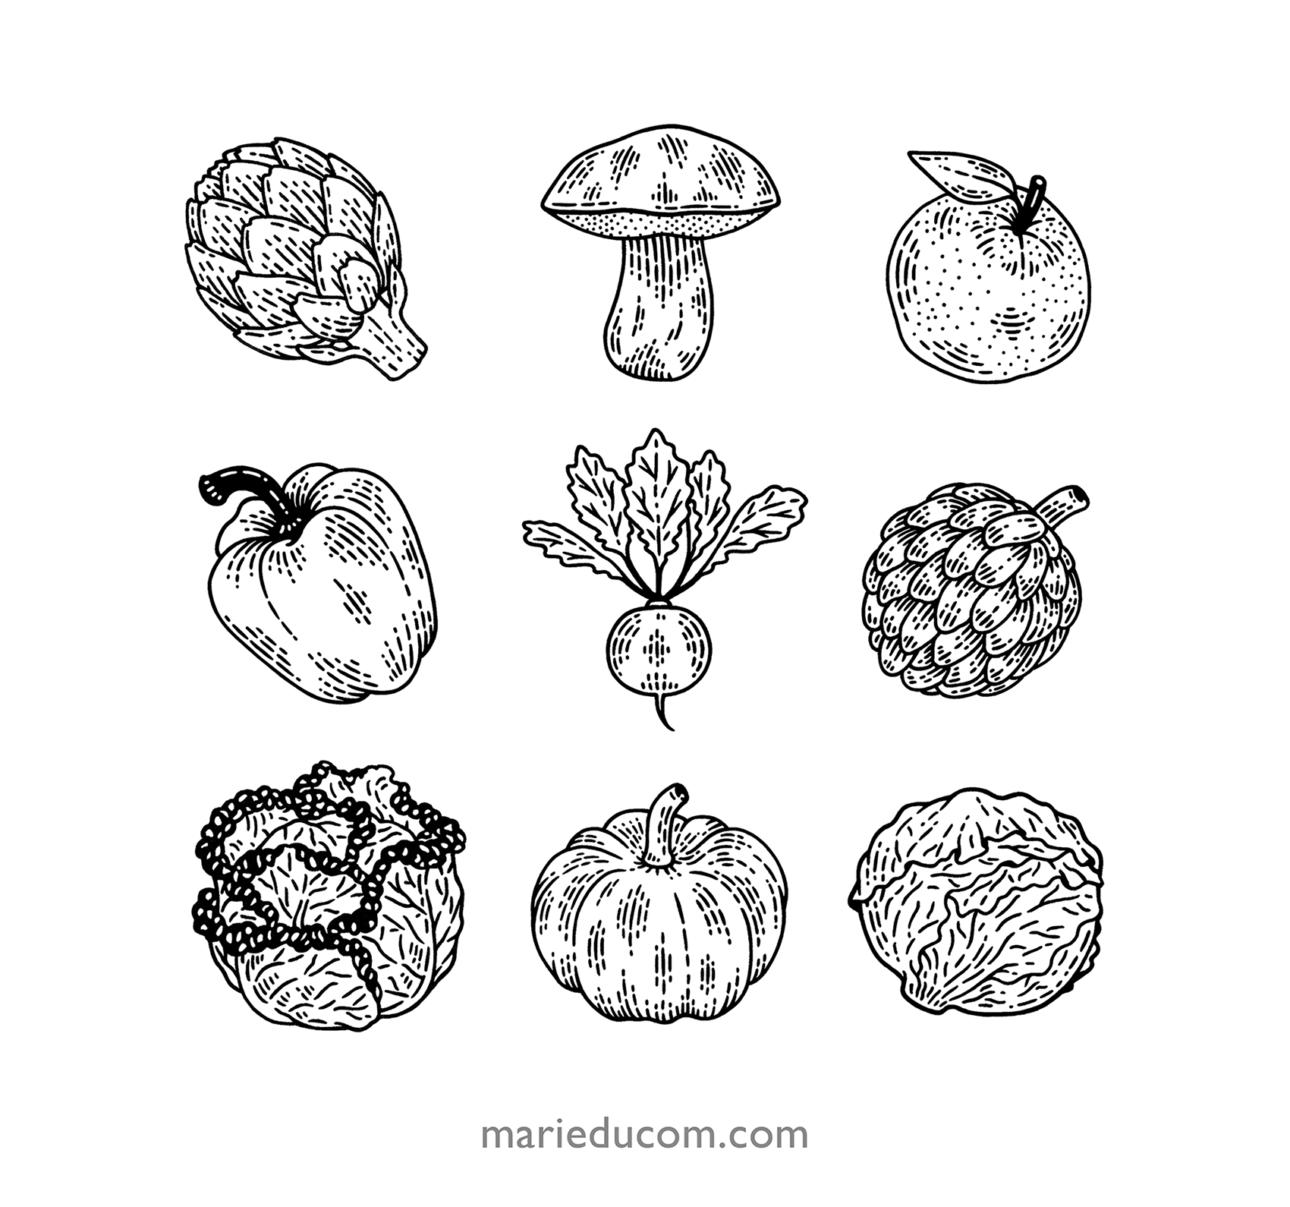 Fruits-vegetables-1-Marie-Ducom-2021